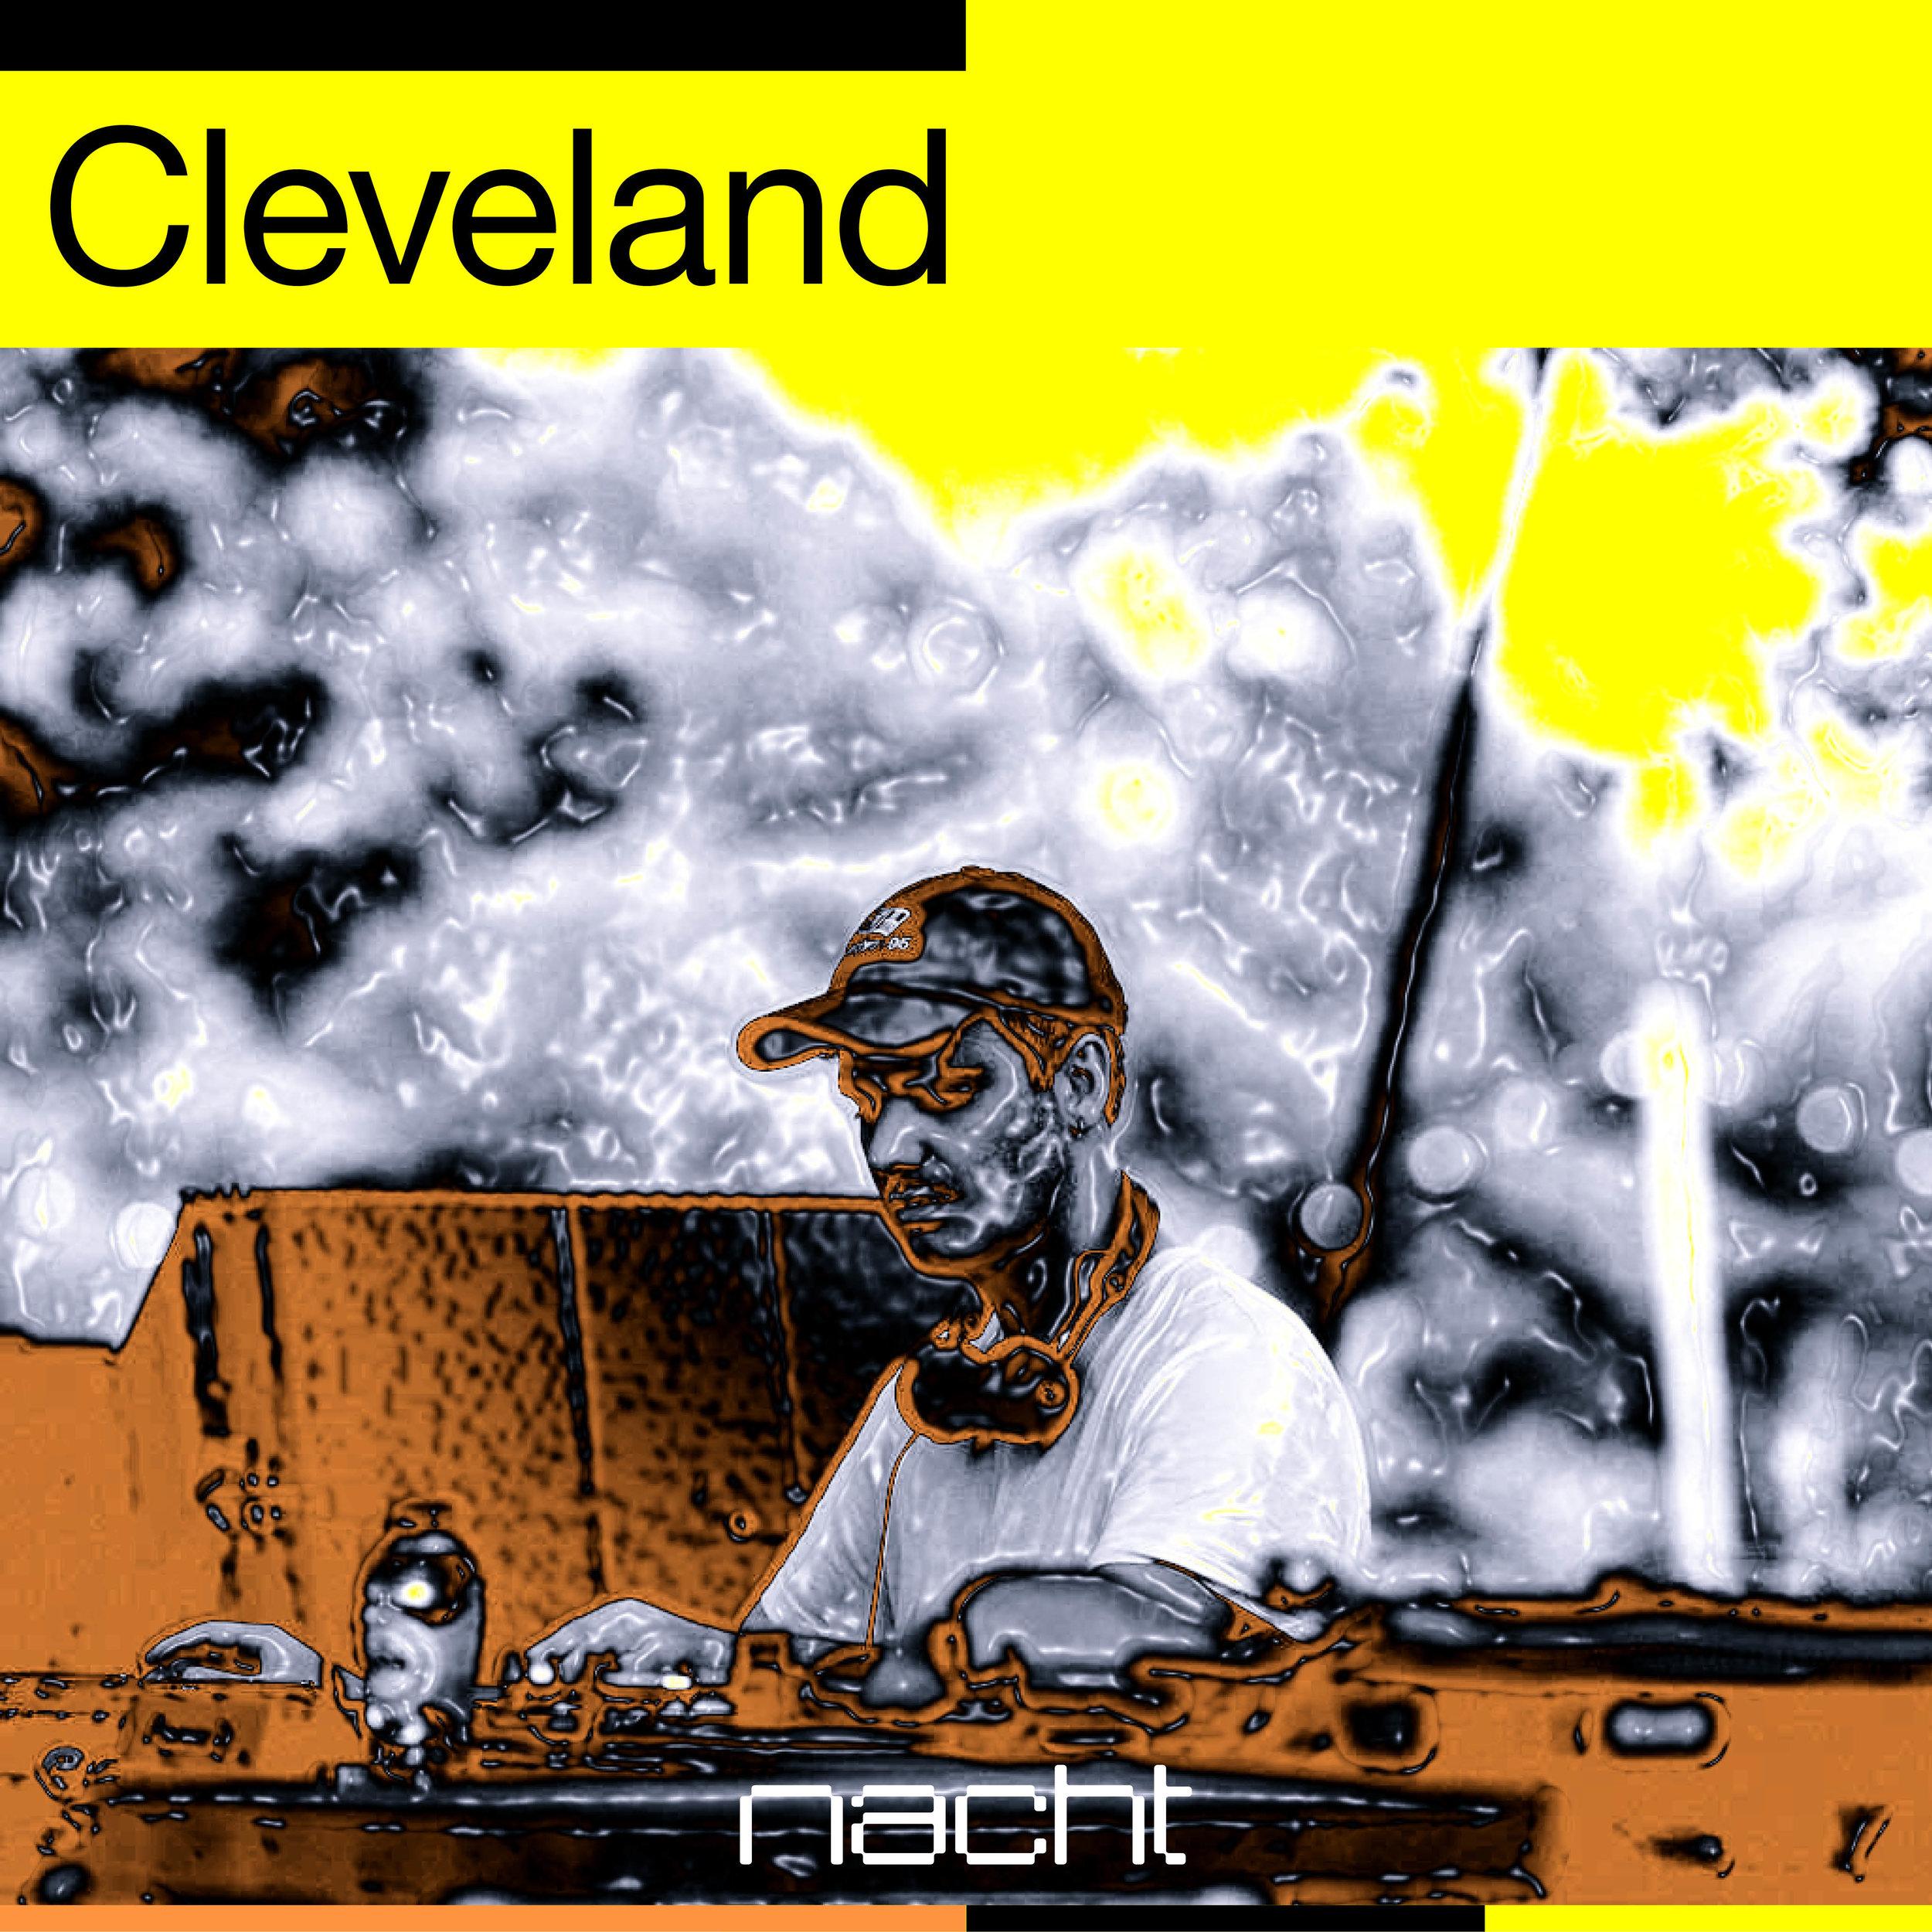 Cleveland 1x1.jpg